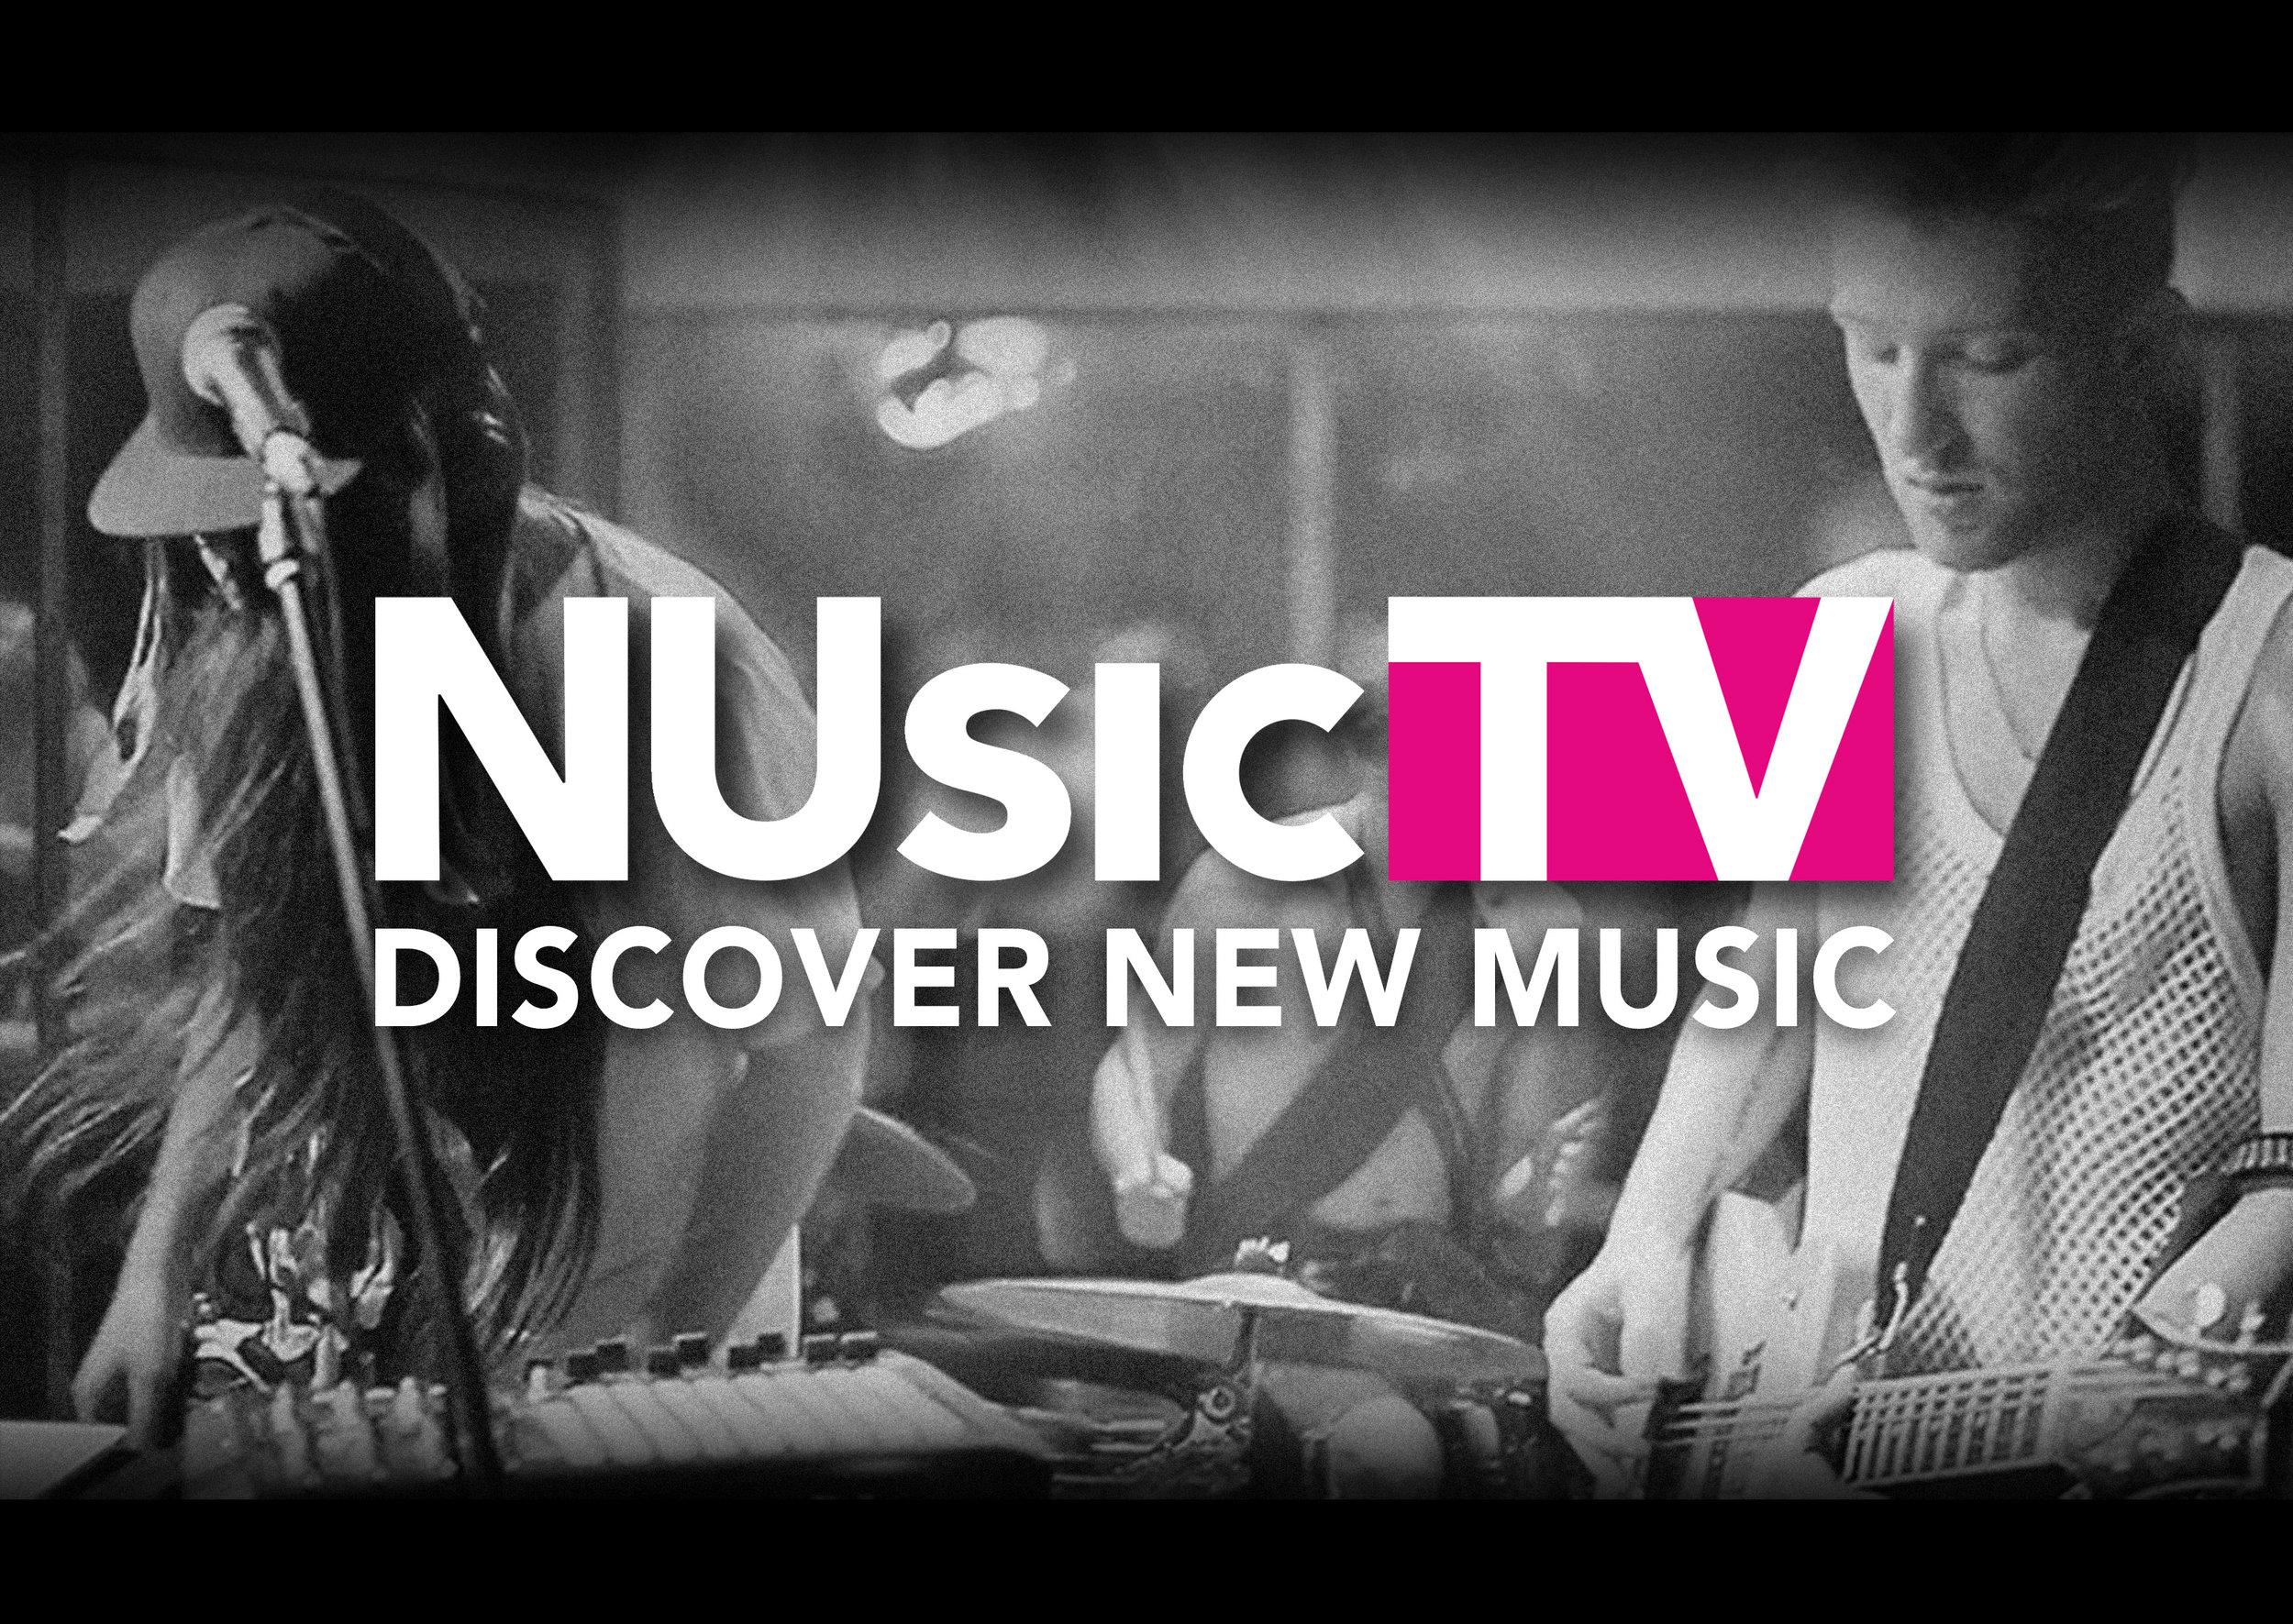 NUsicTV_cover2.jpg